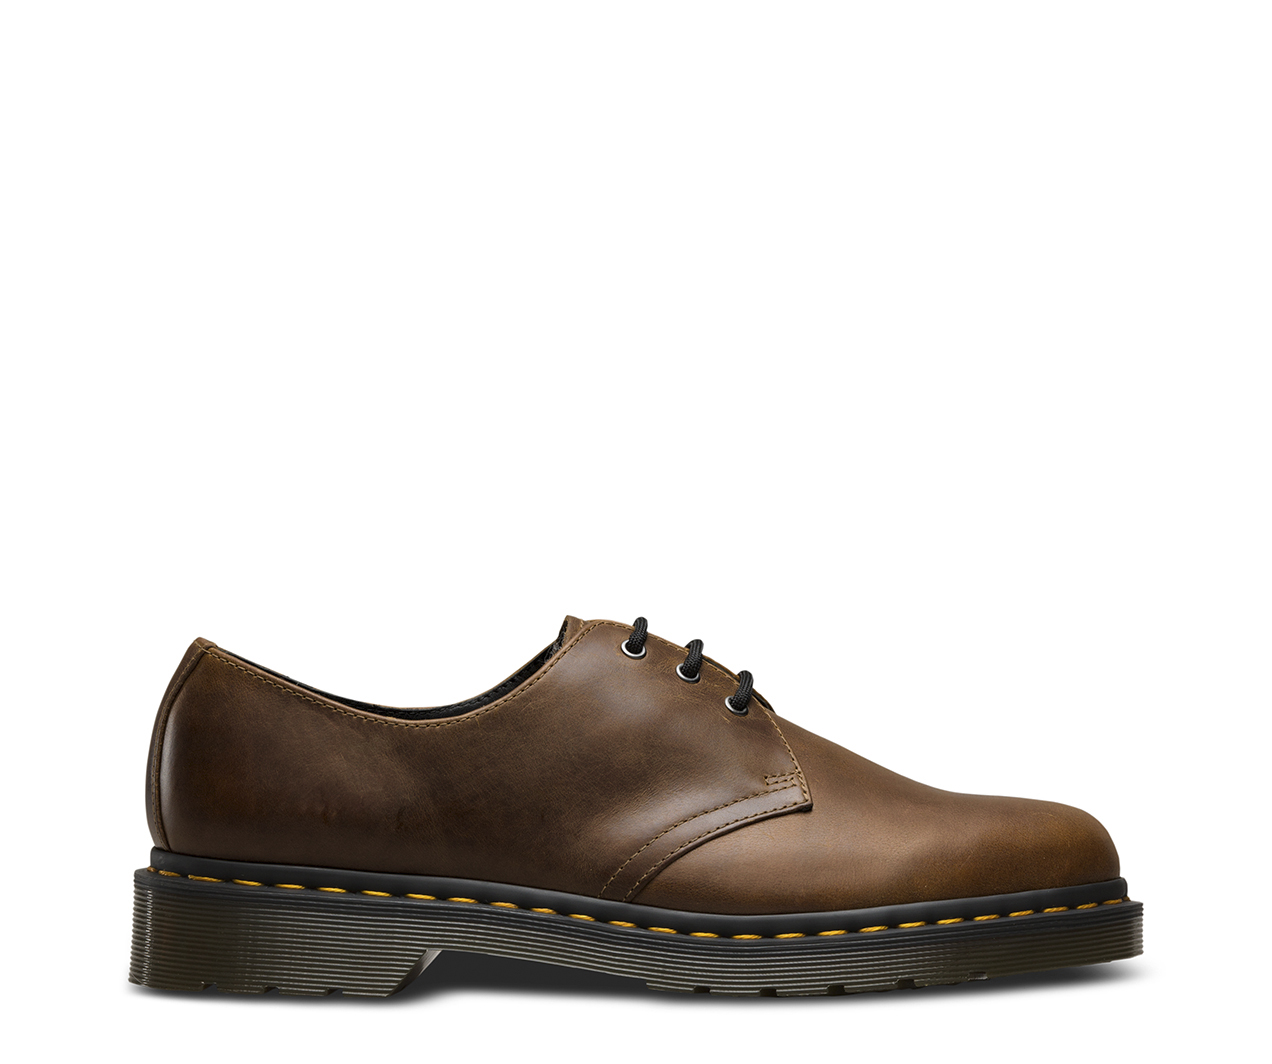 Dr.Martens Mens 1461 3 Eyelet Gunmetal Leather Shoes 46 EU Mm74An